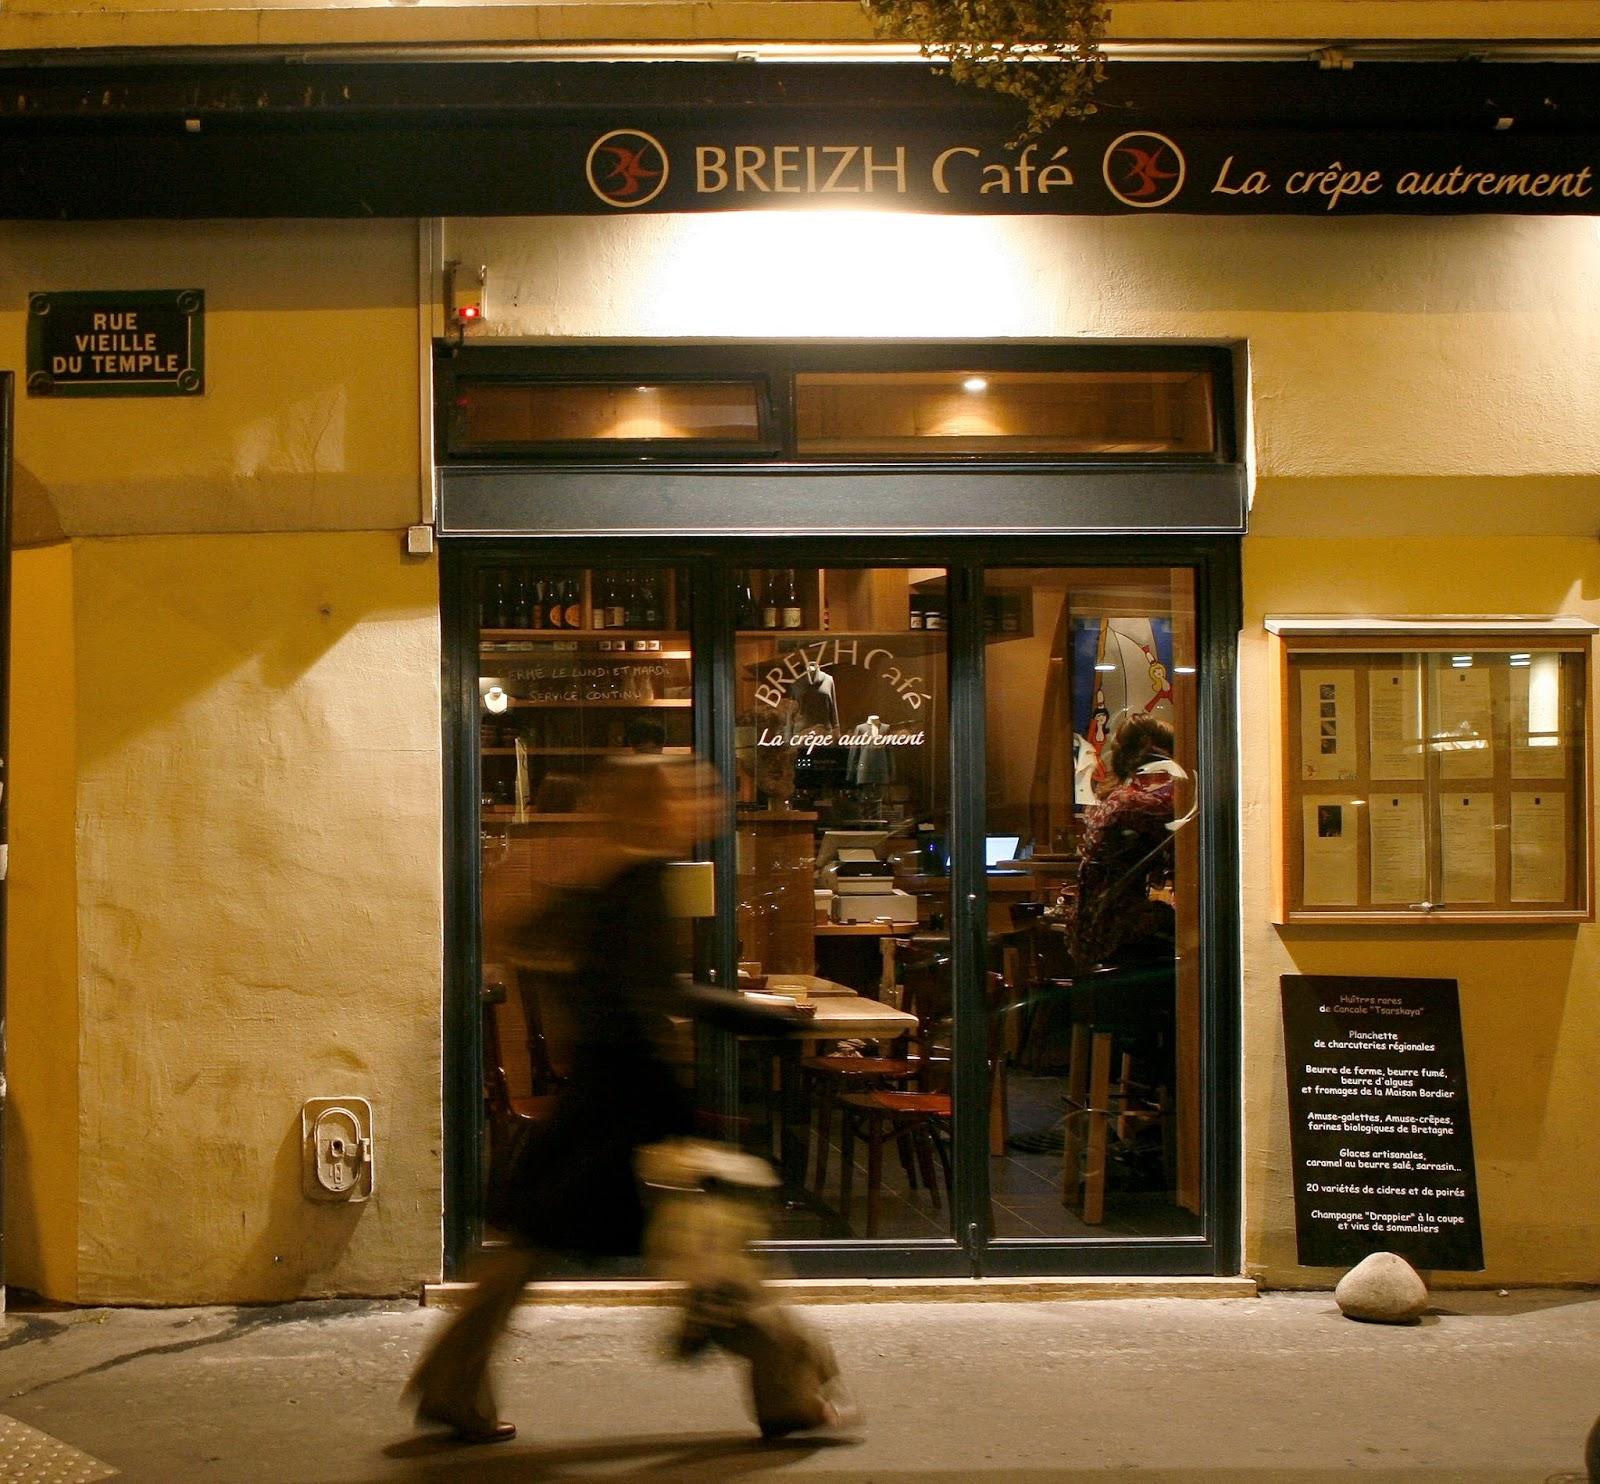 Breizh Cafe, Breizh Café, Best Family Restaurant in Paris